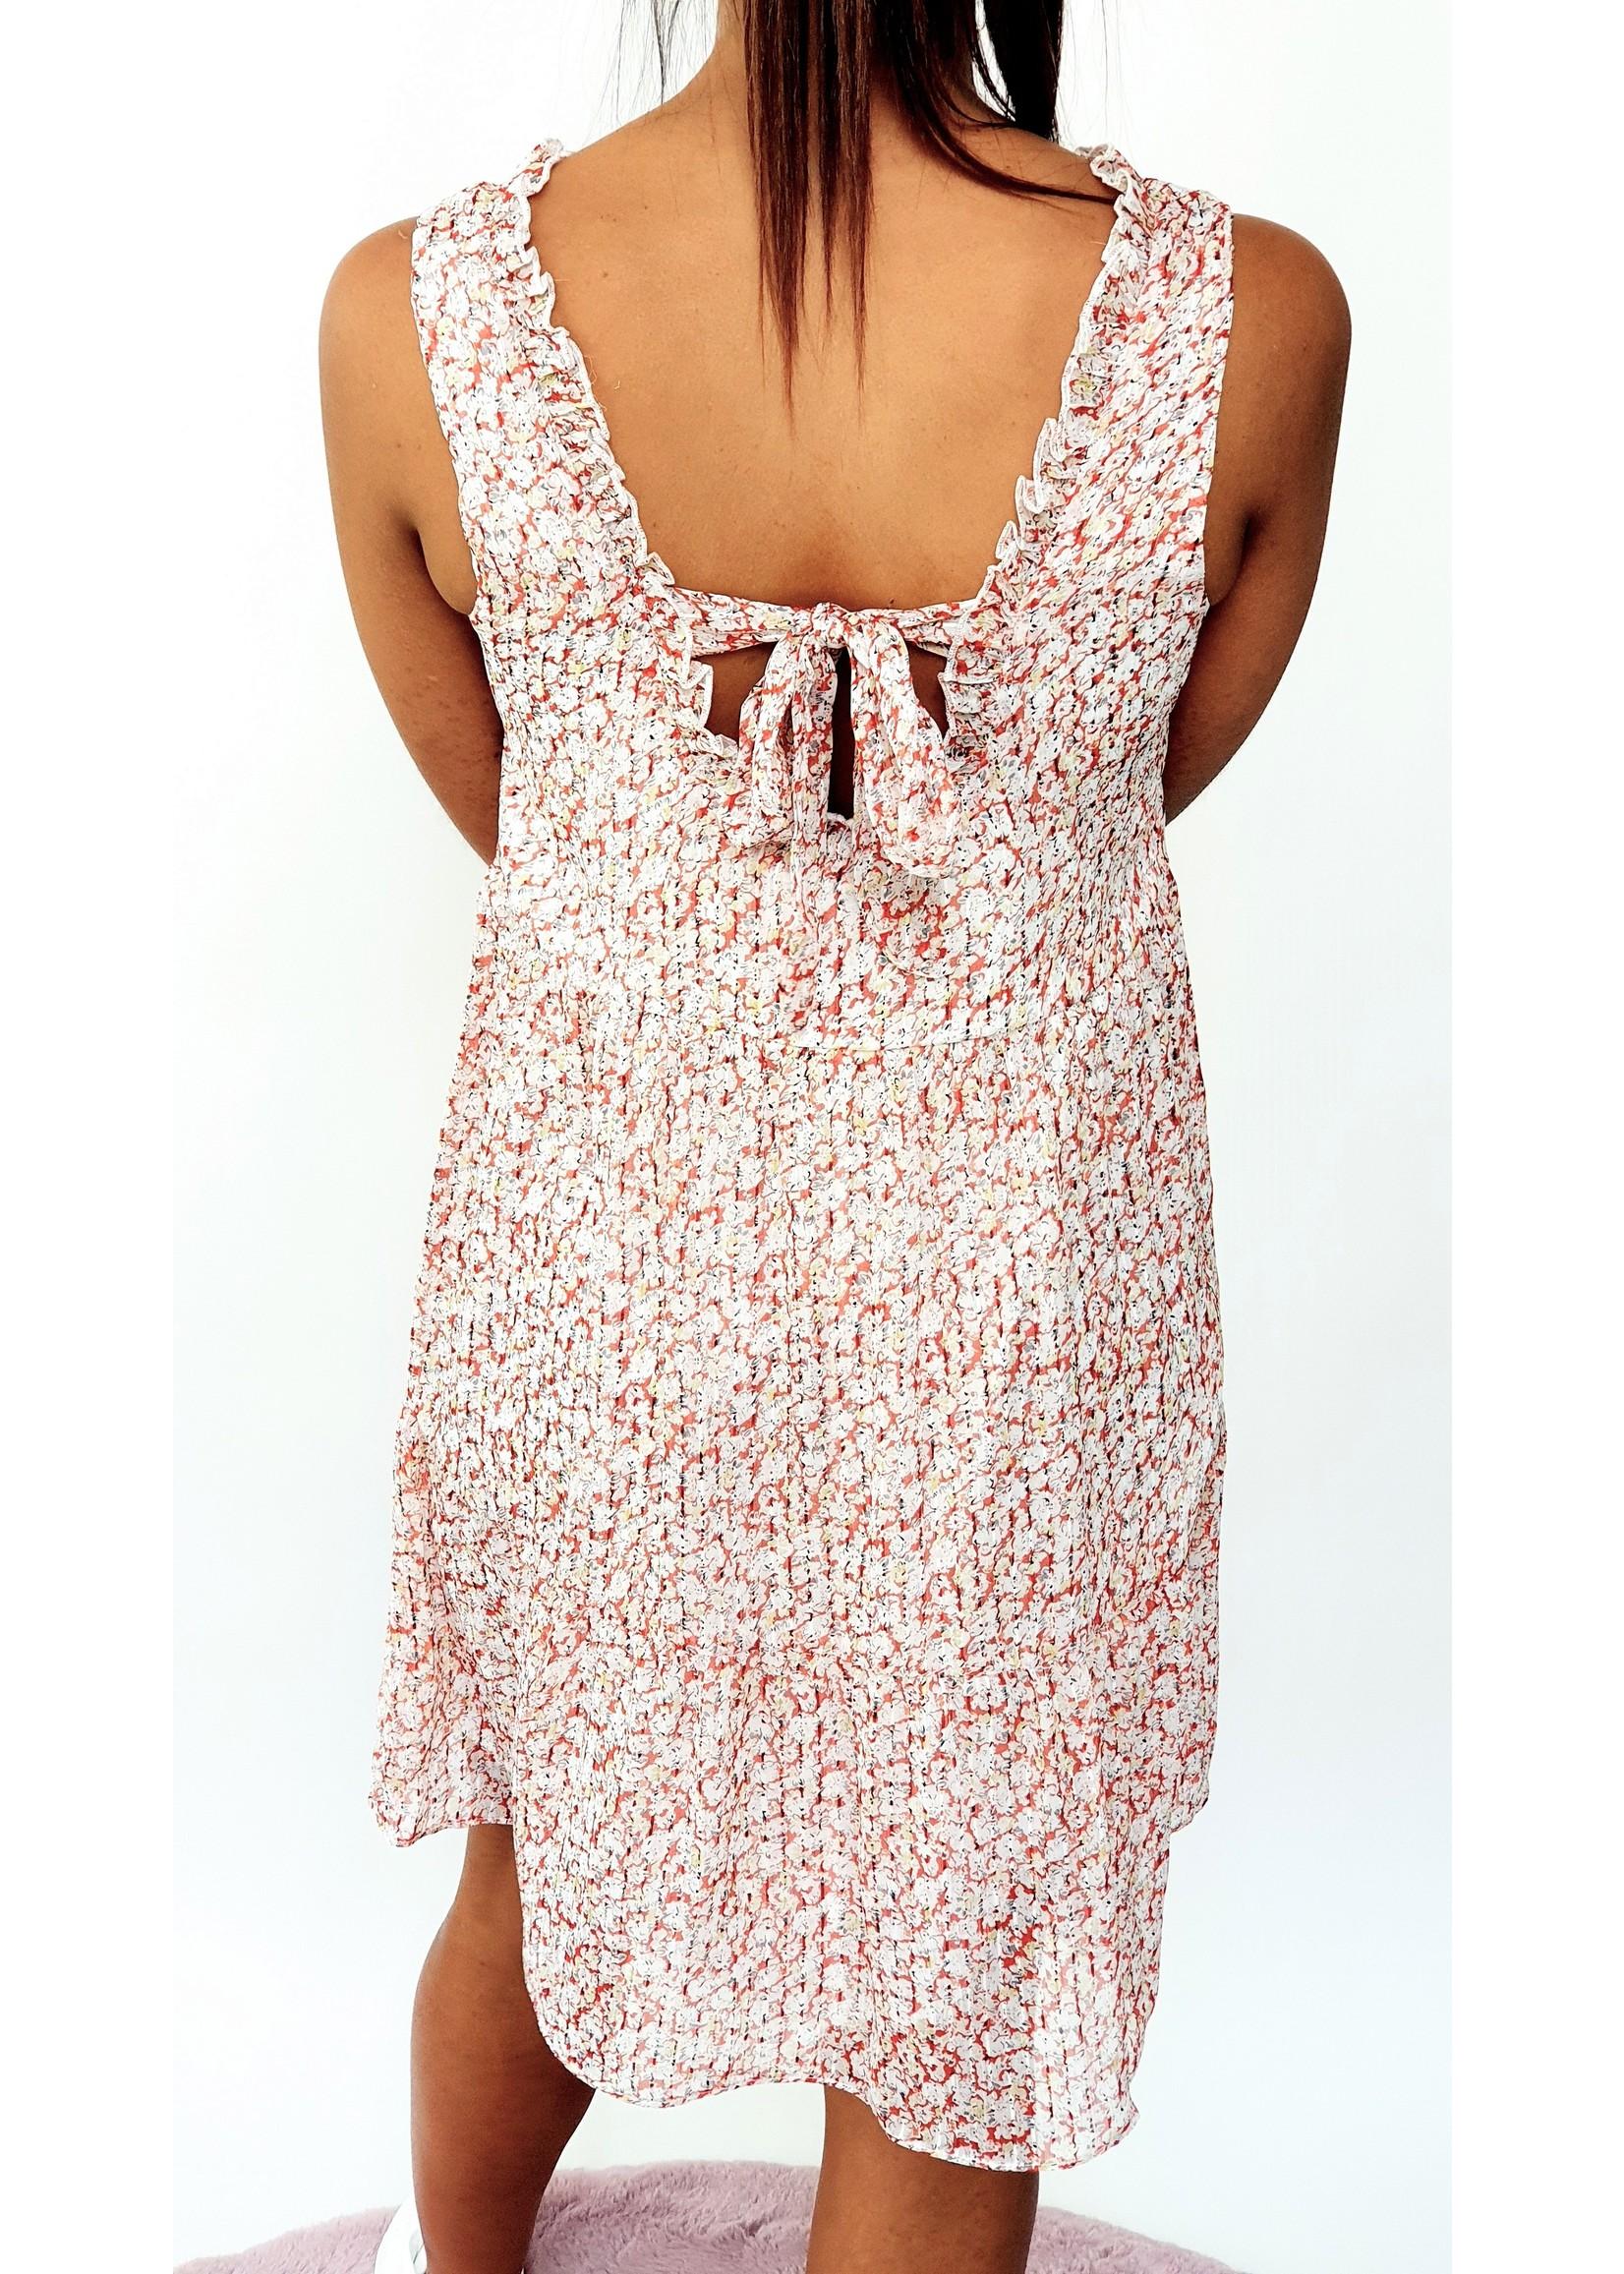 Thé cuty dress